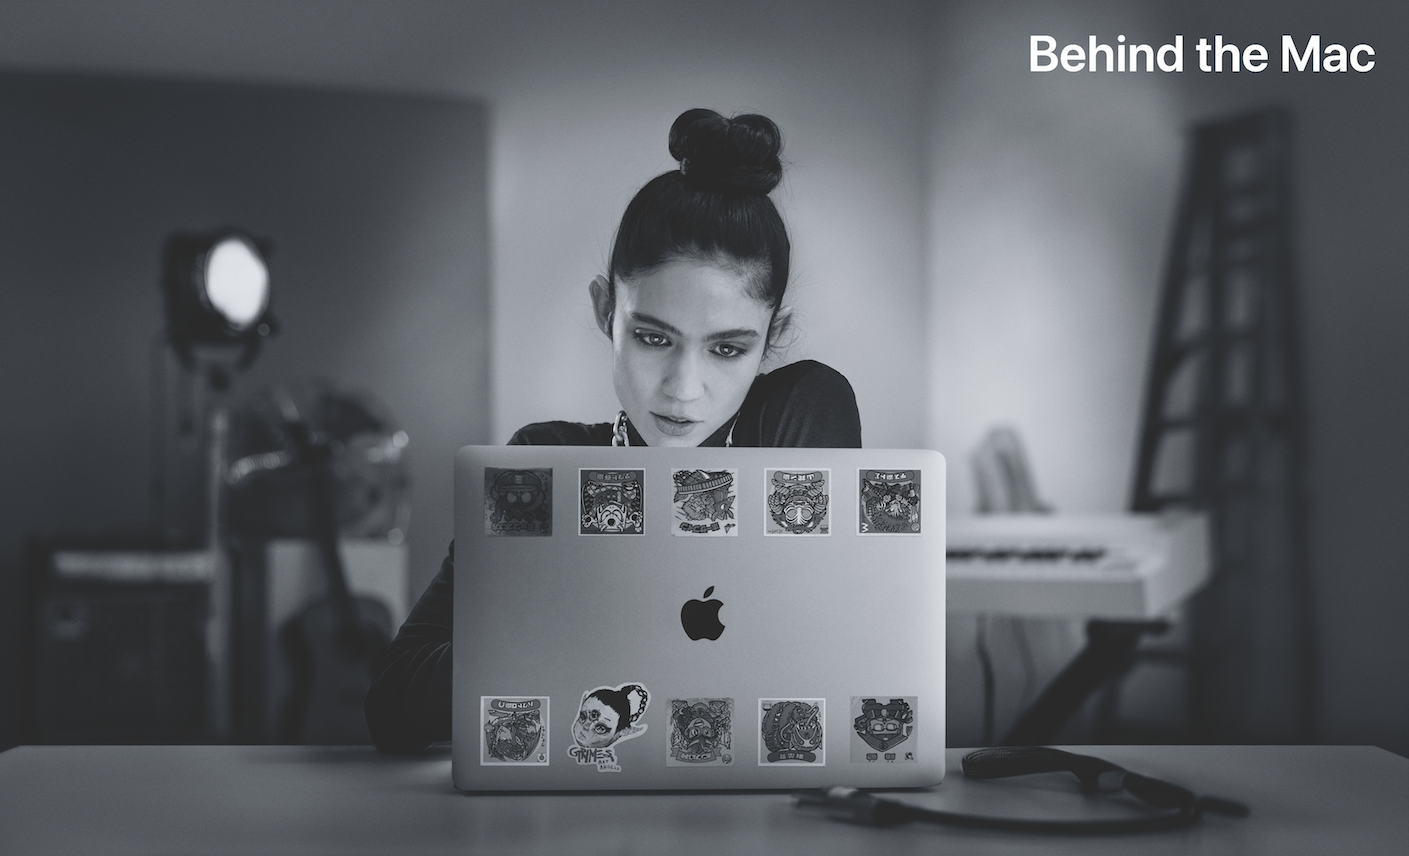 Thumbnail for Behind the Mac